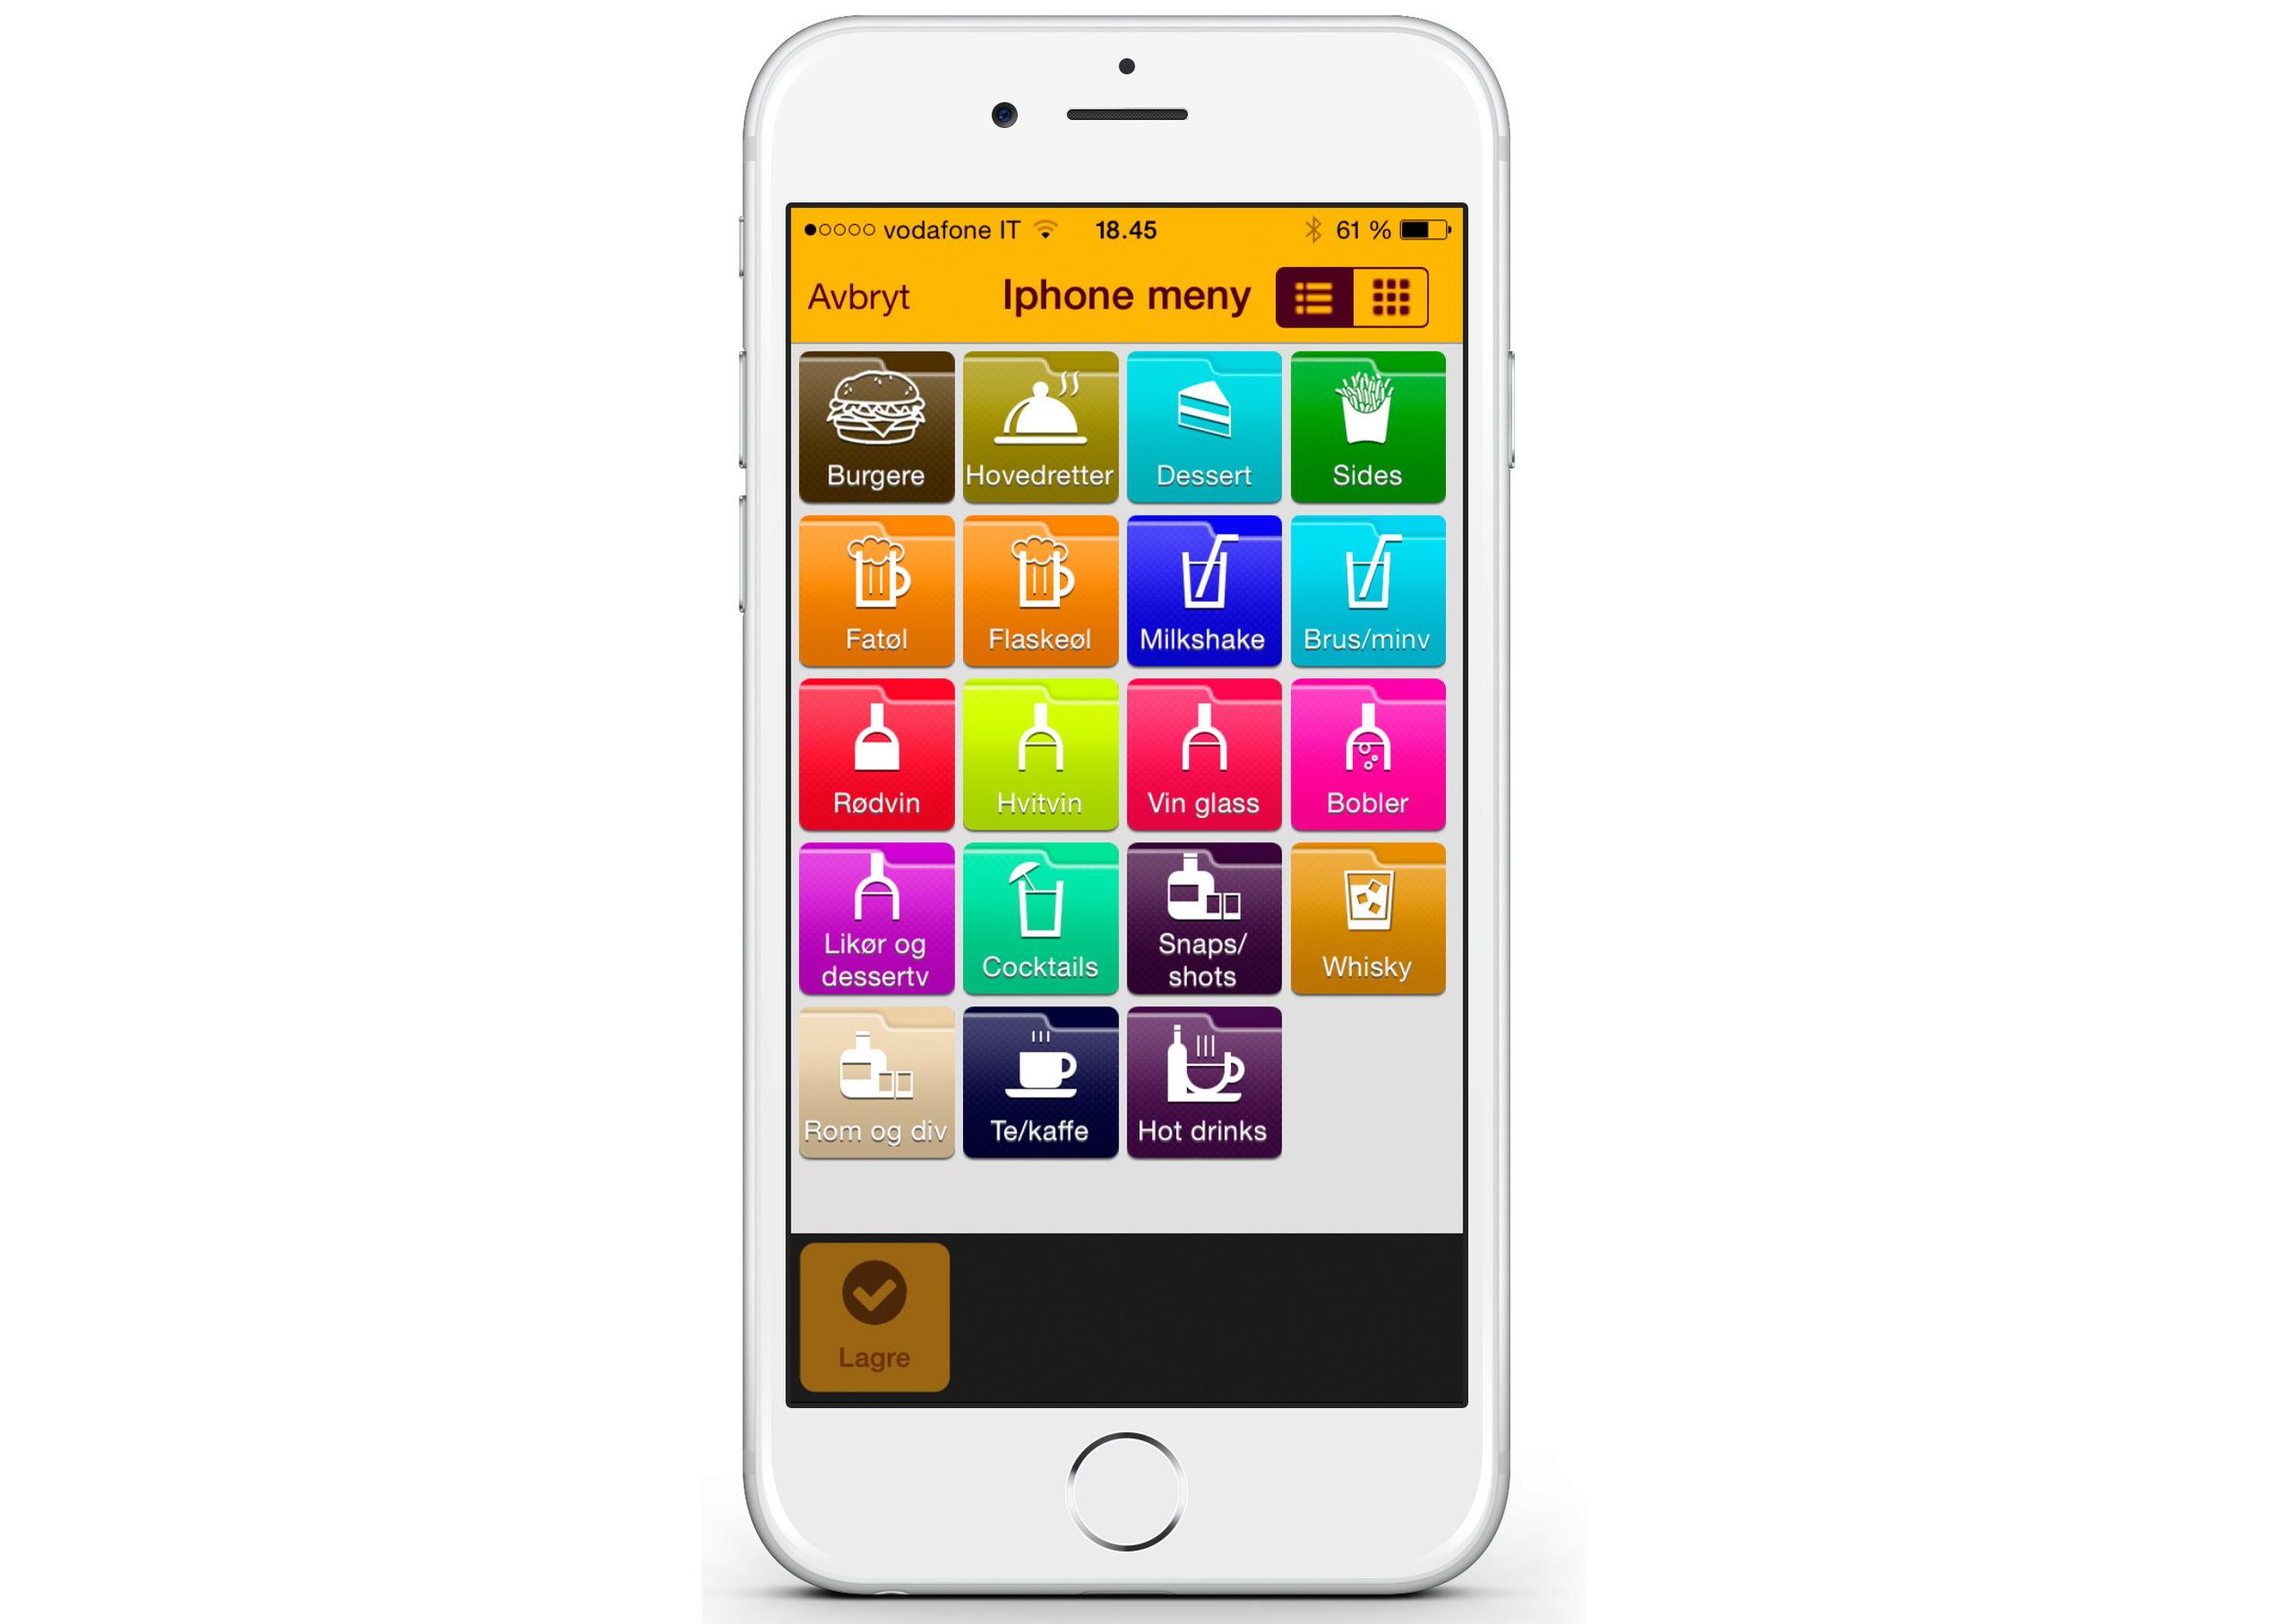 iphone-gastro4.jpg